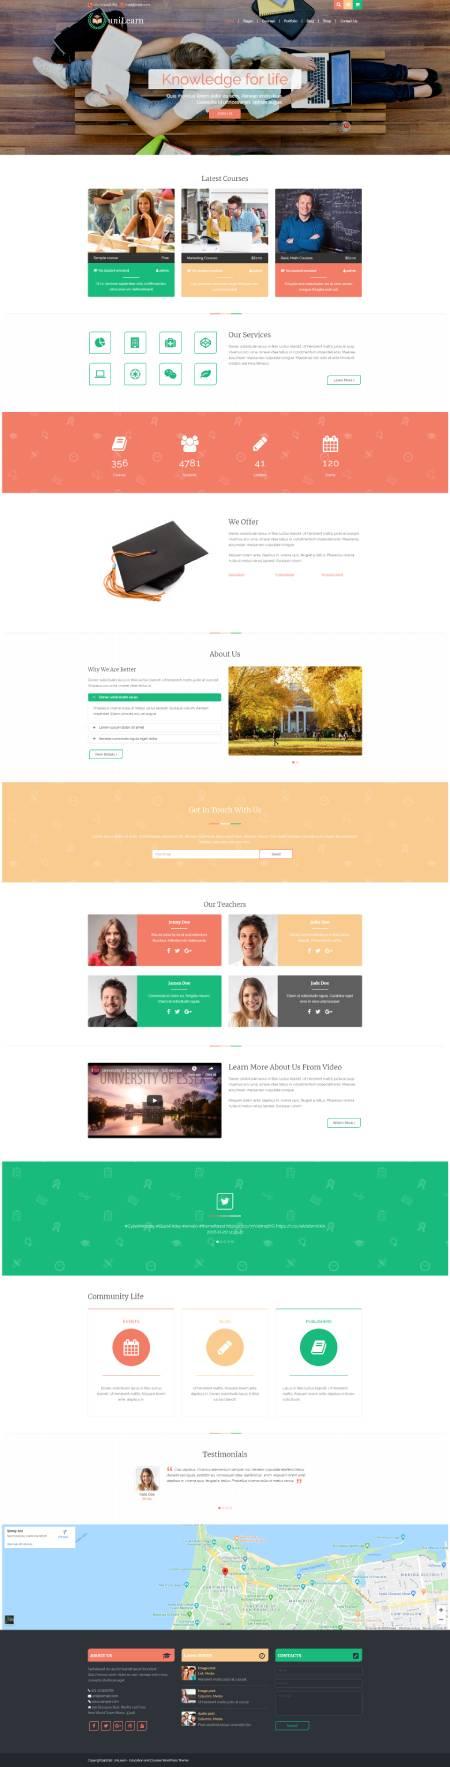 GD0068 – Mẫu Website Giới Thiệu Khóa Học Online UniLearn